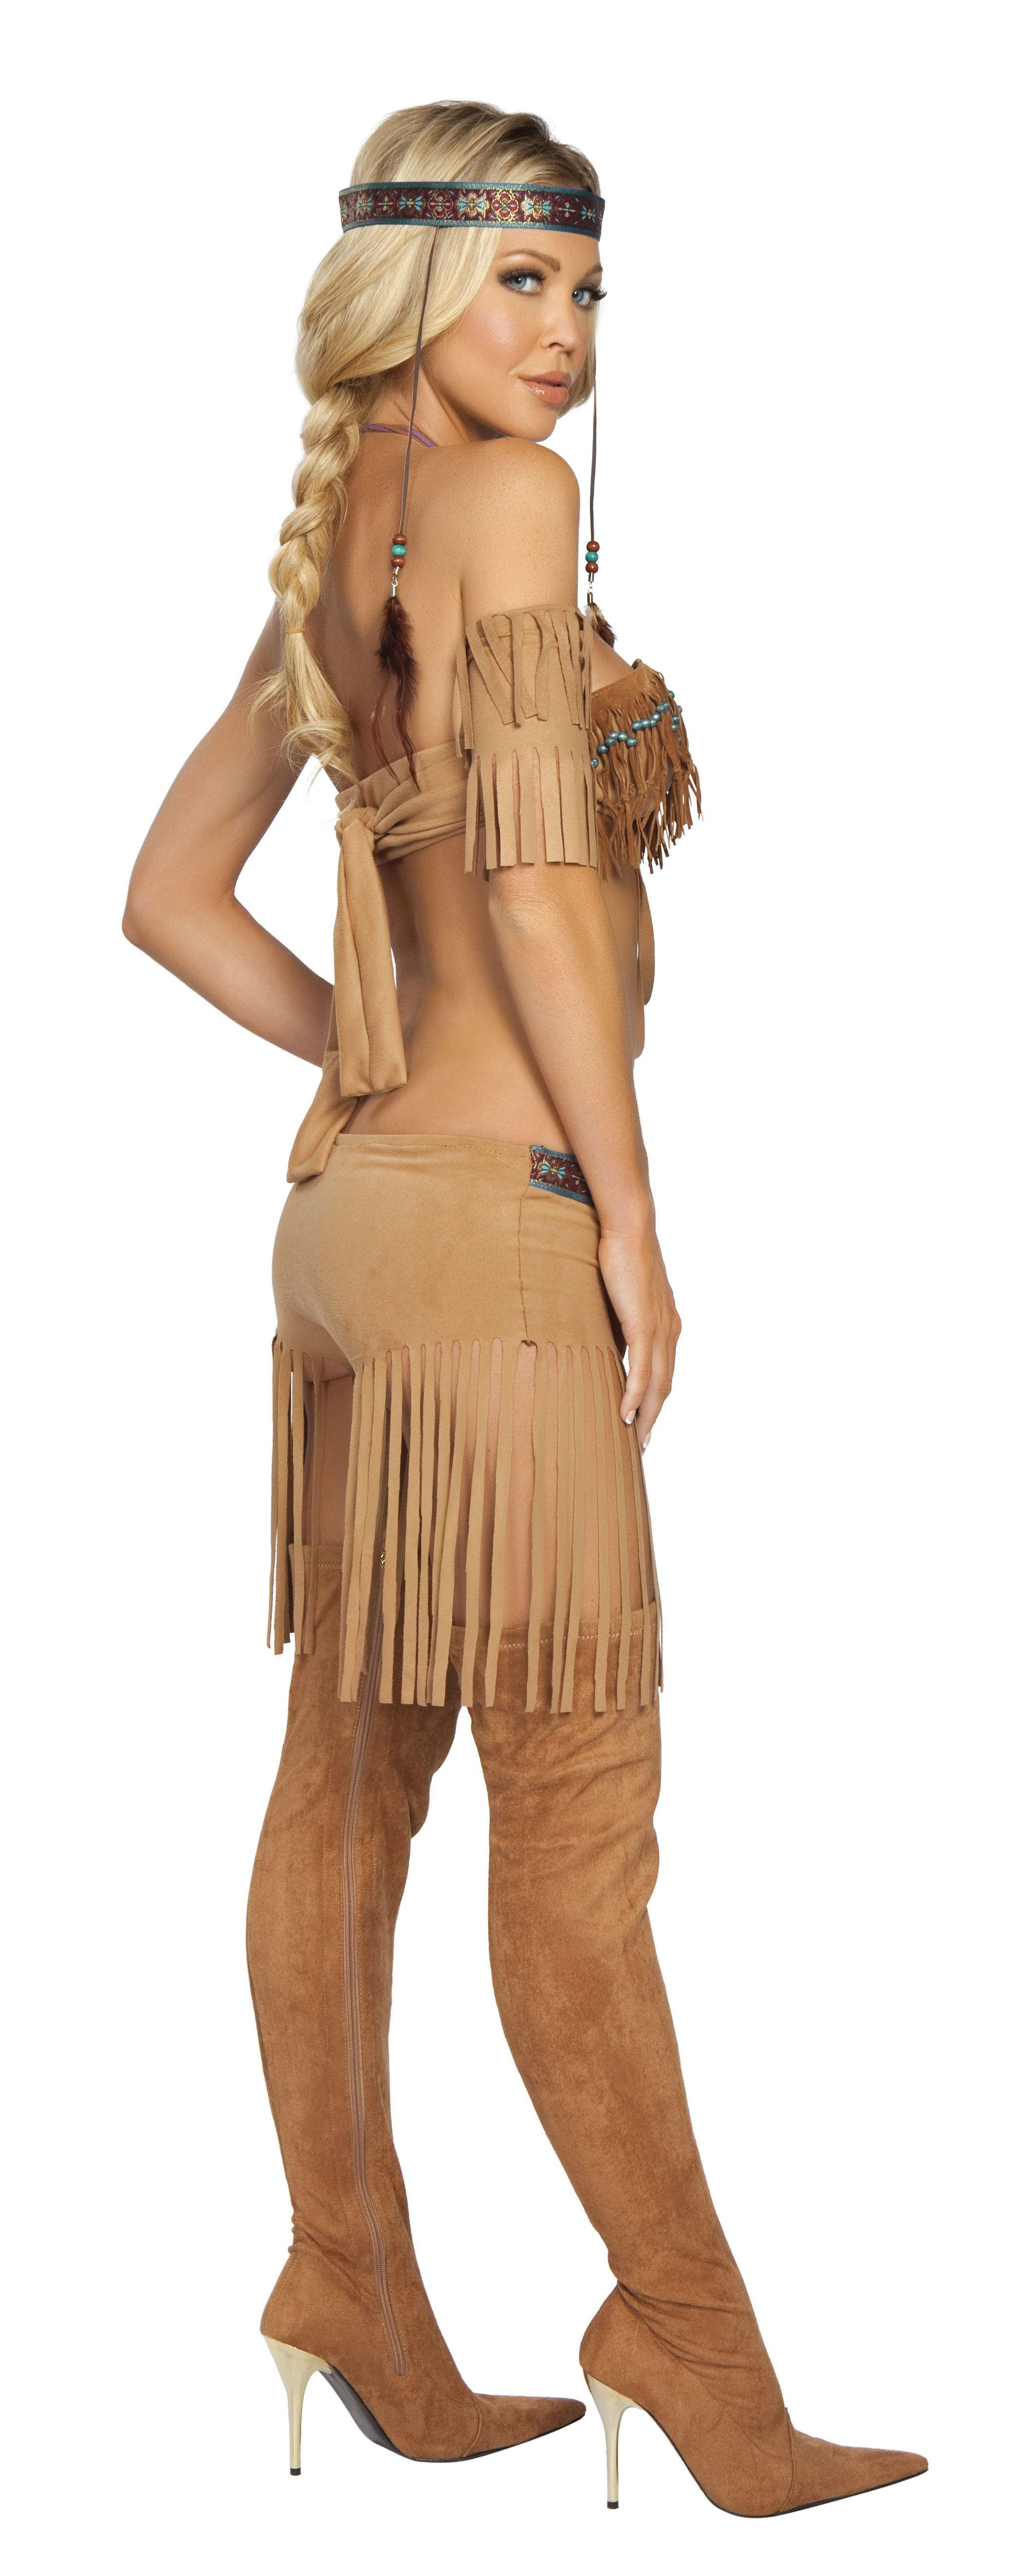 naked cherokee women